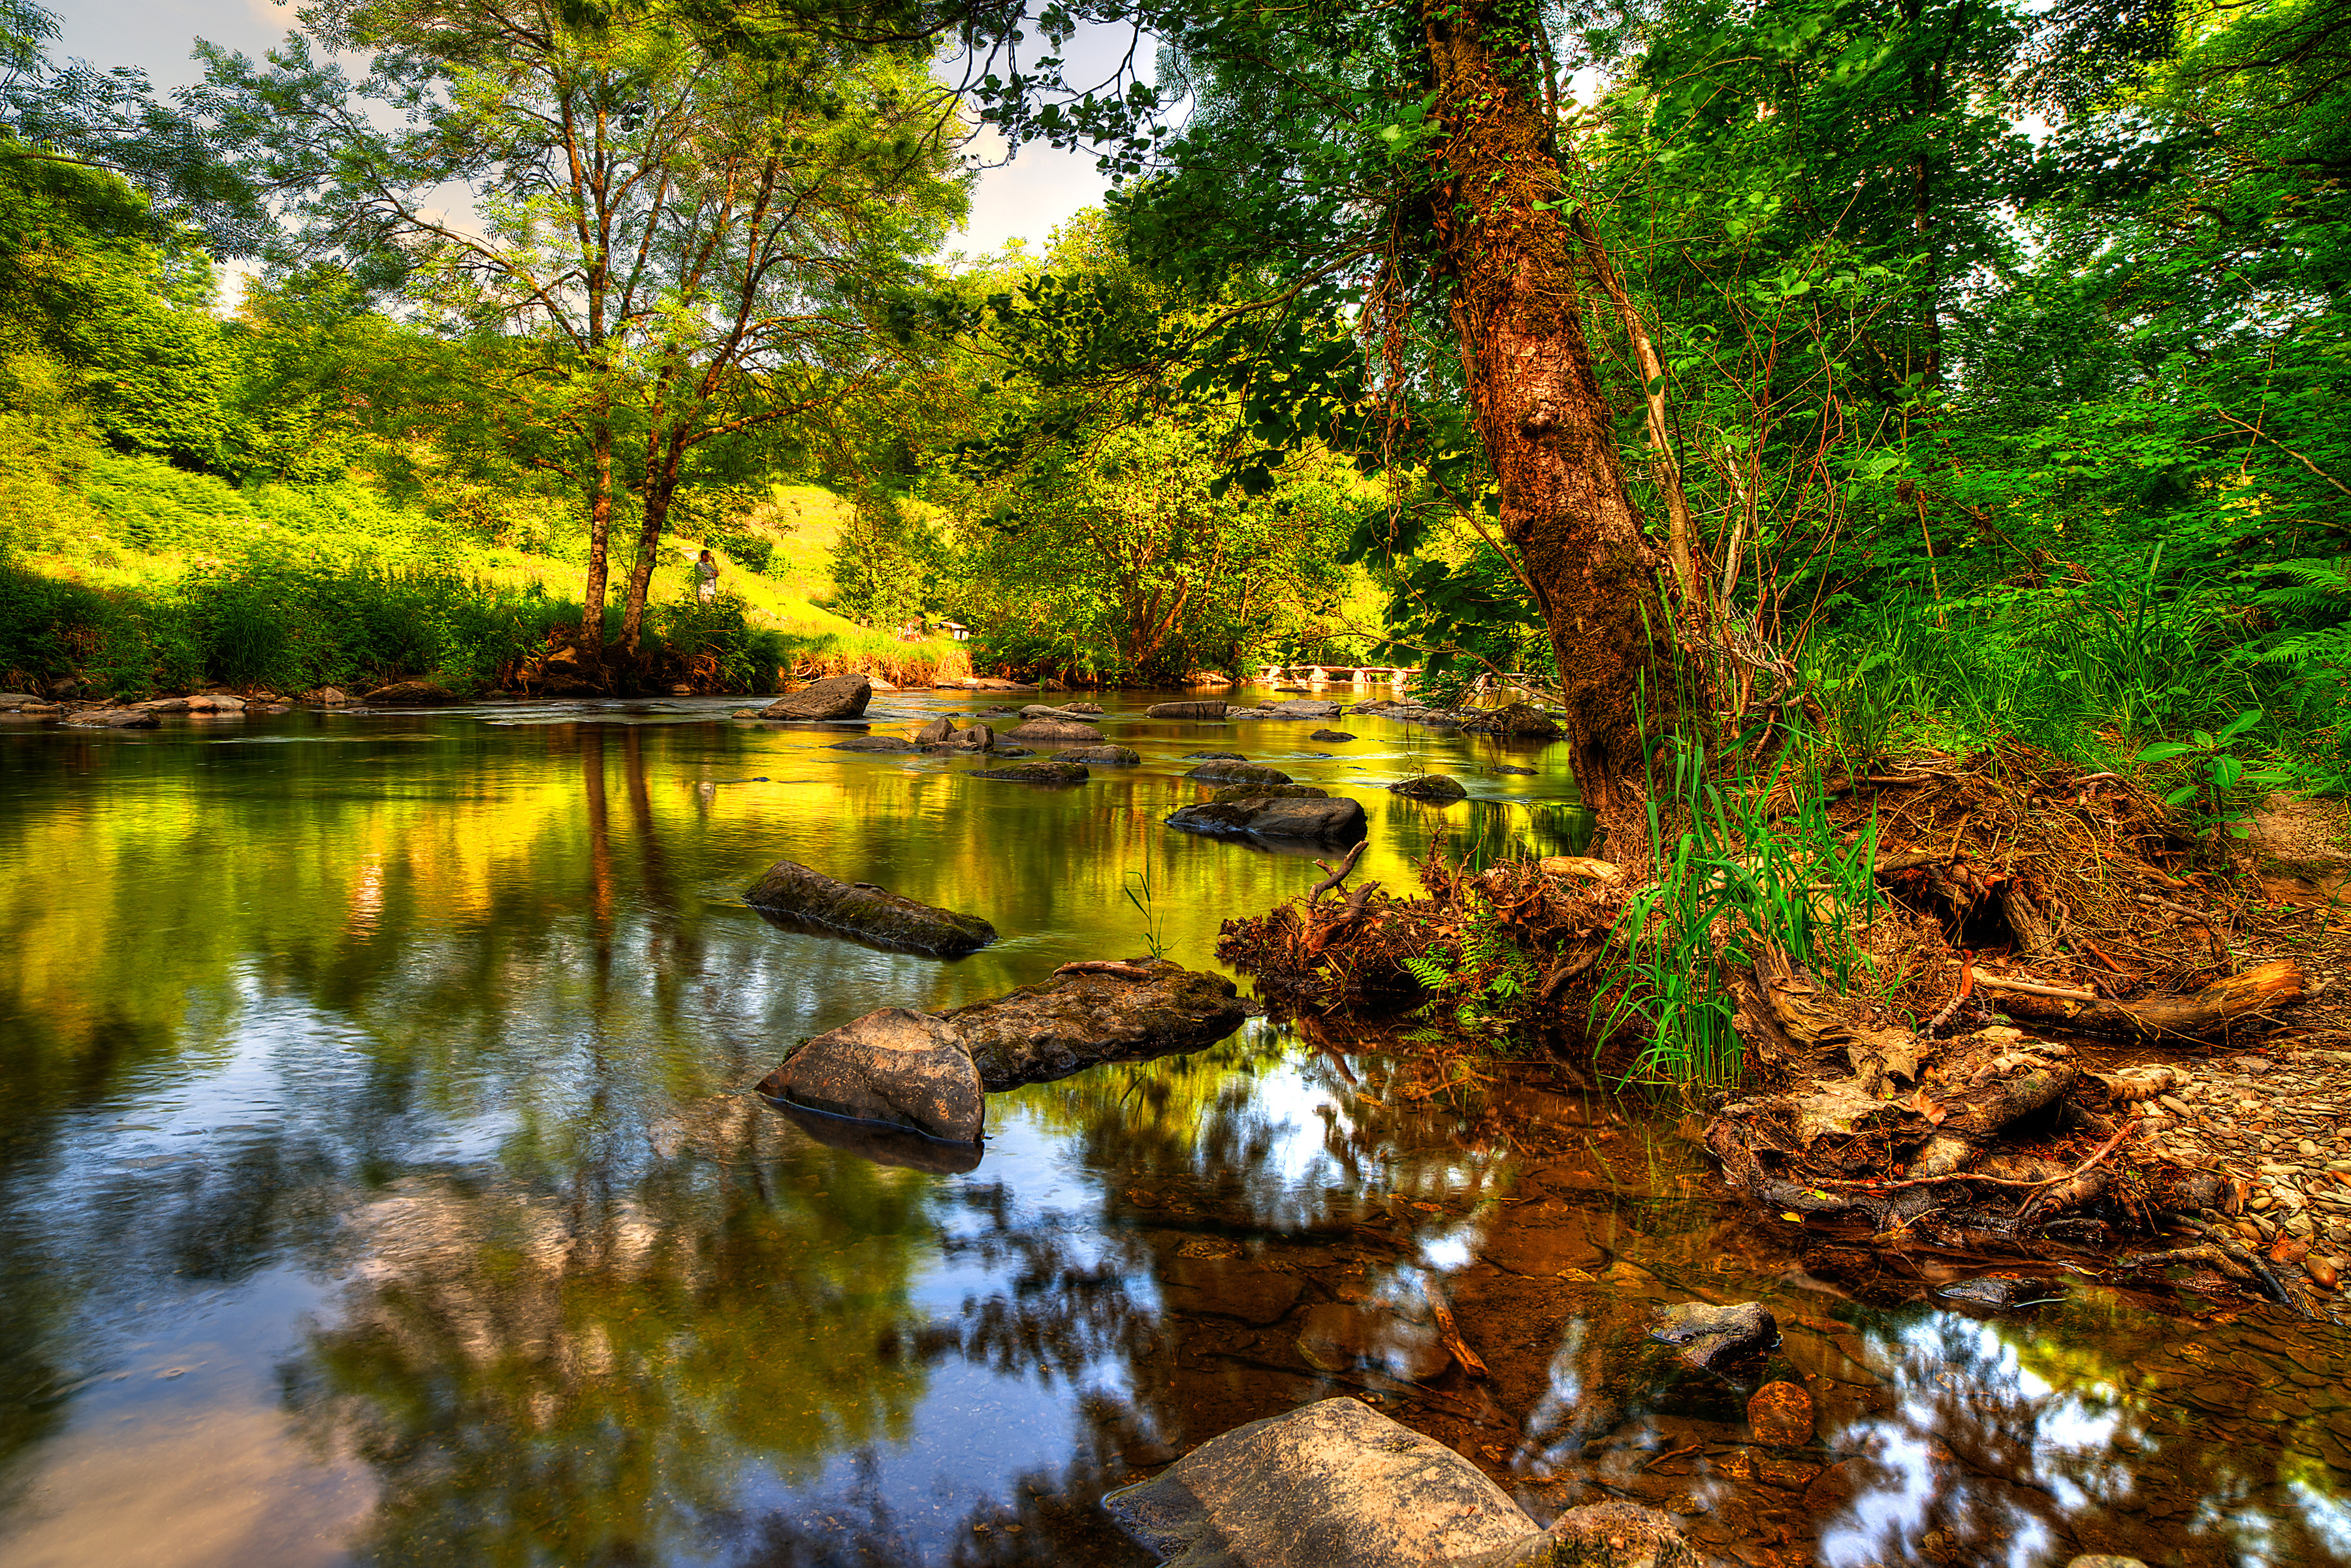 природа камни река деревья nature stones river trees без смс